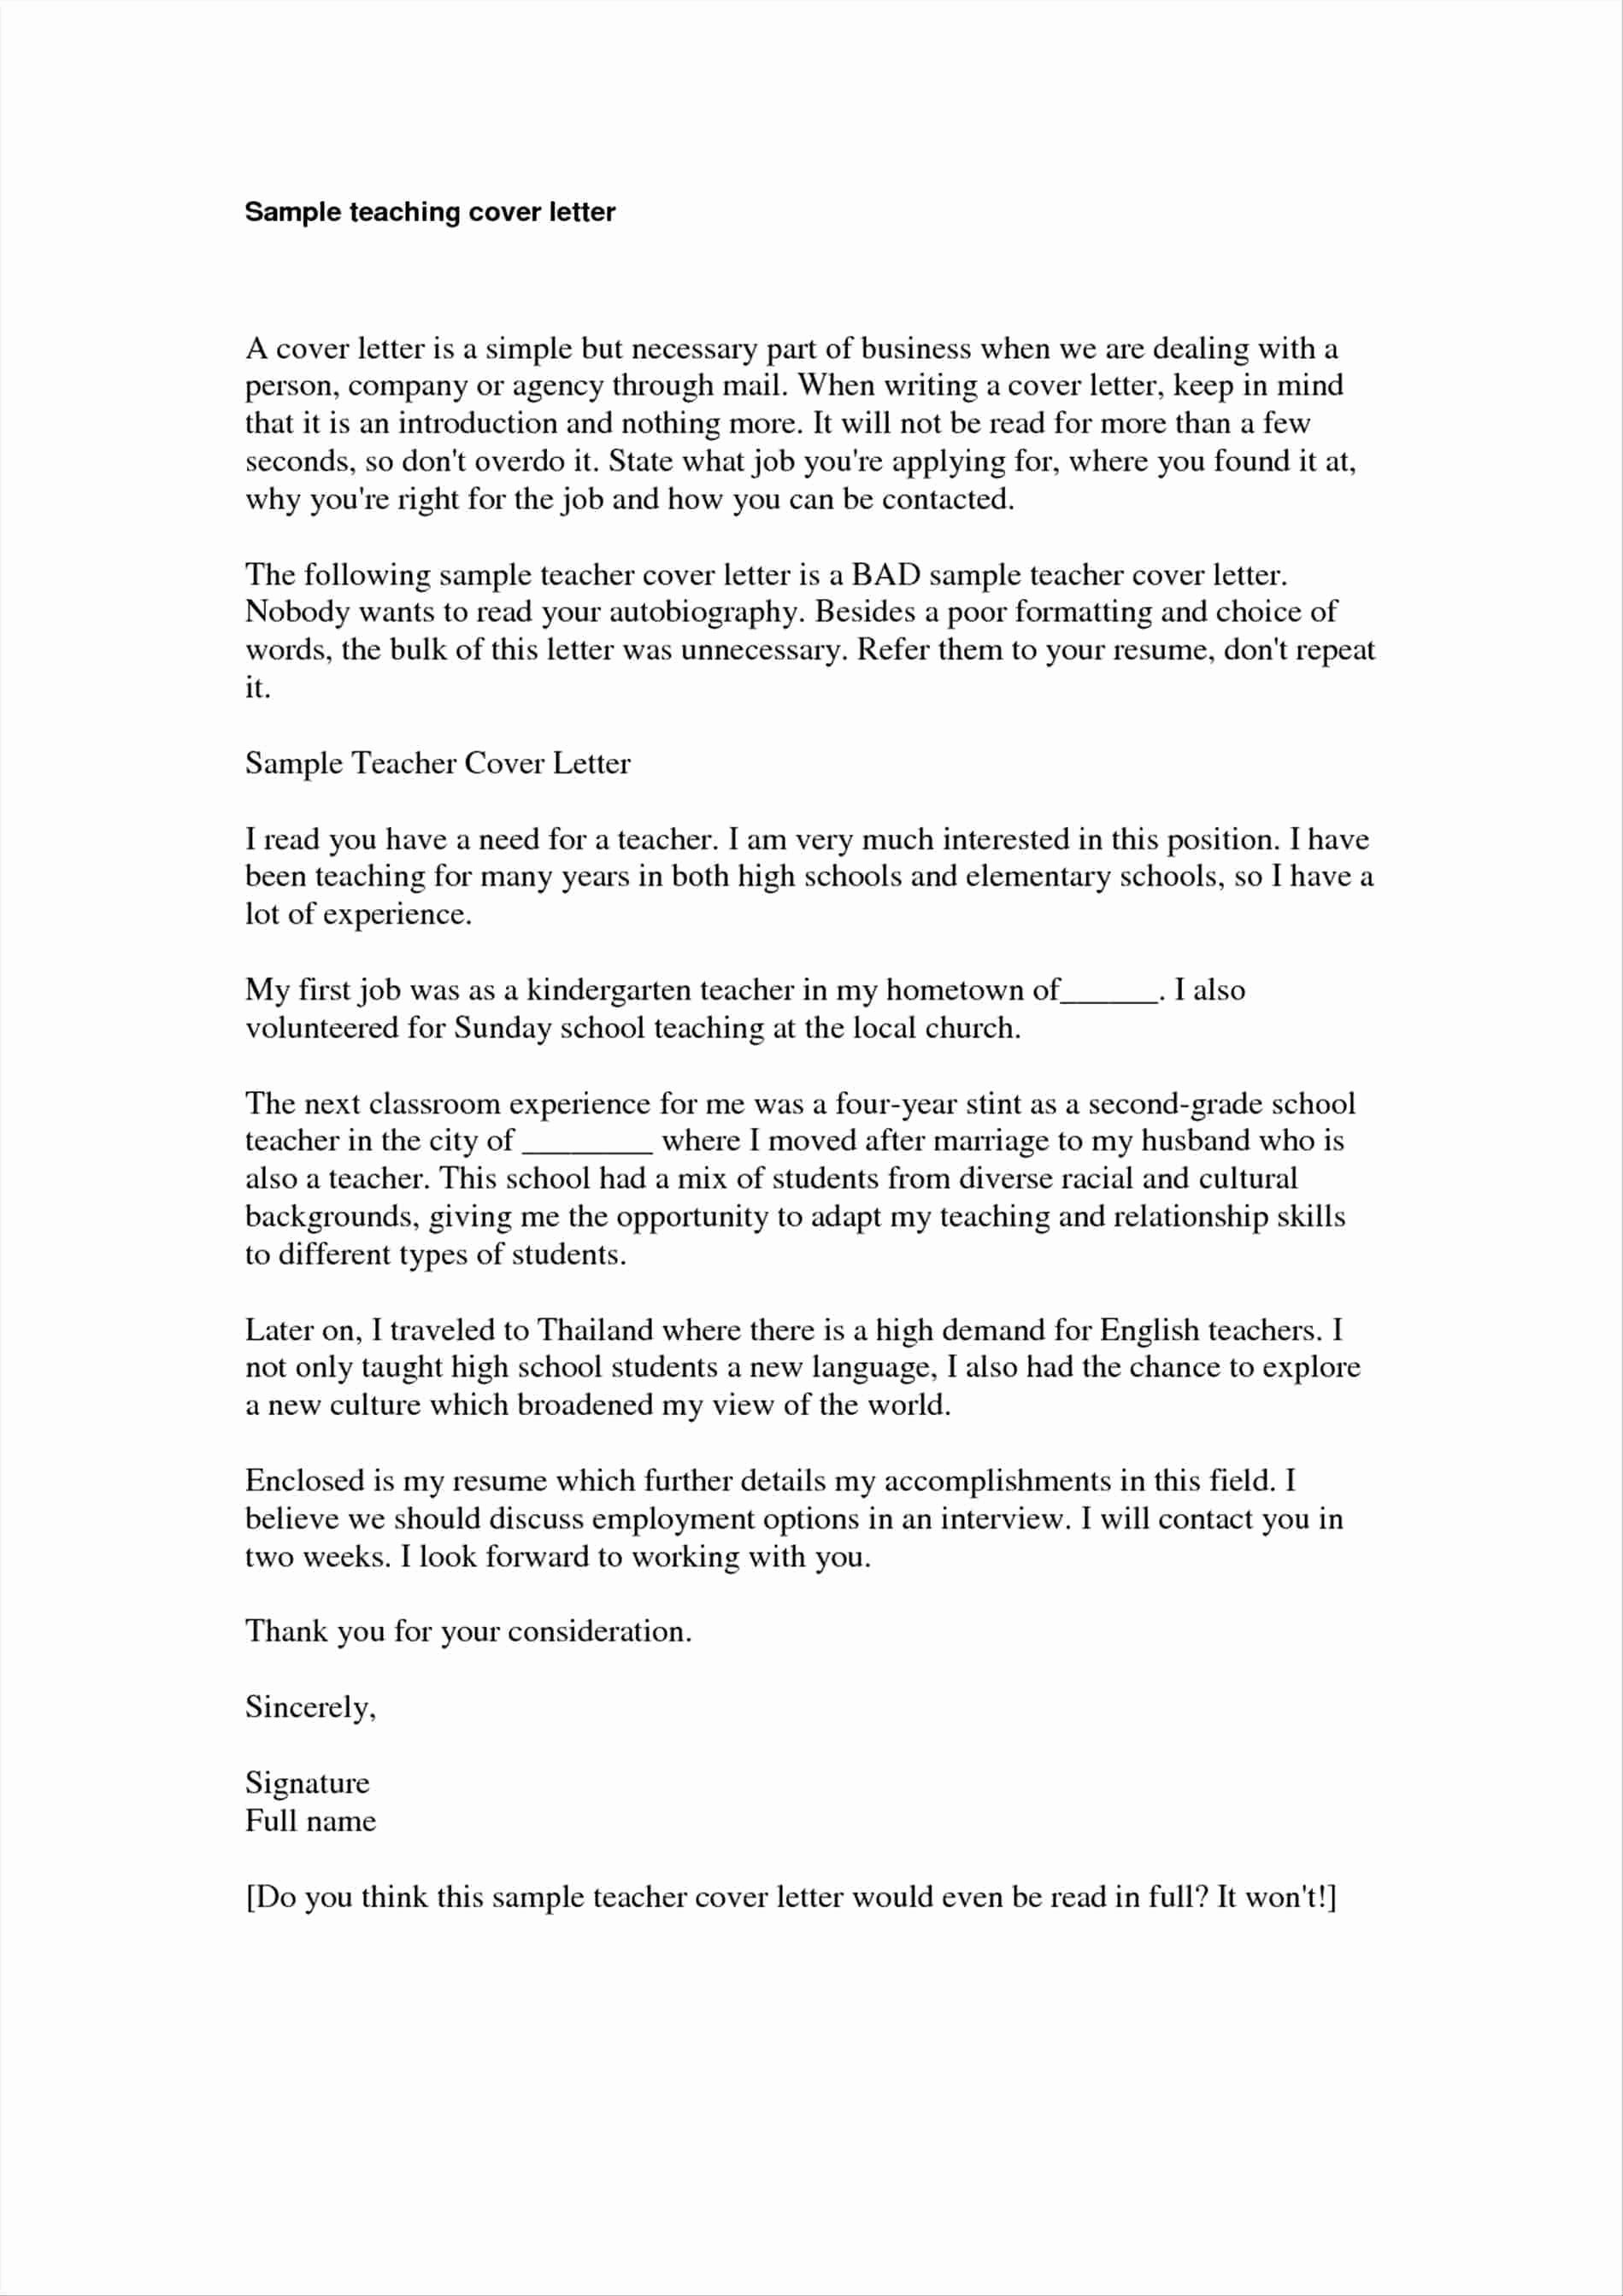 Sample Cover Letter for Ministry Position